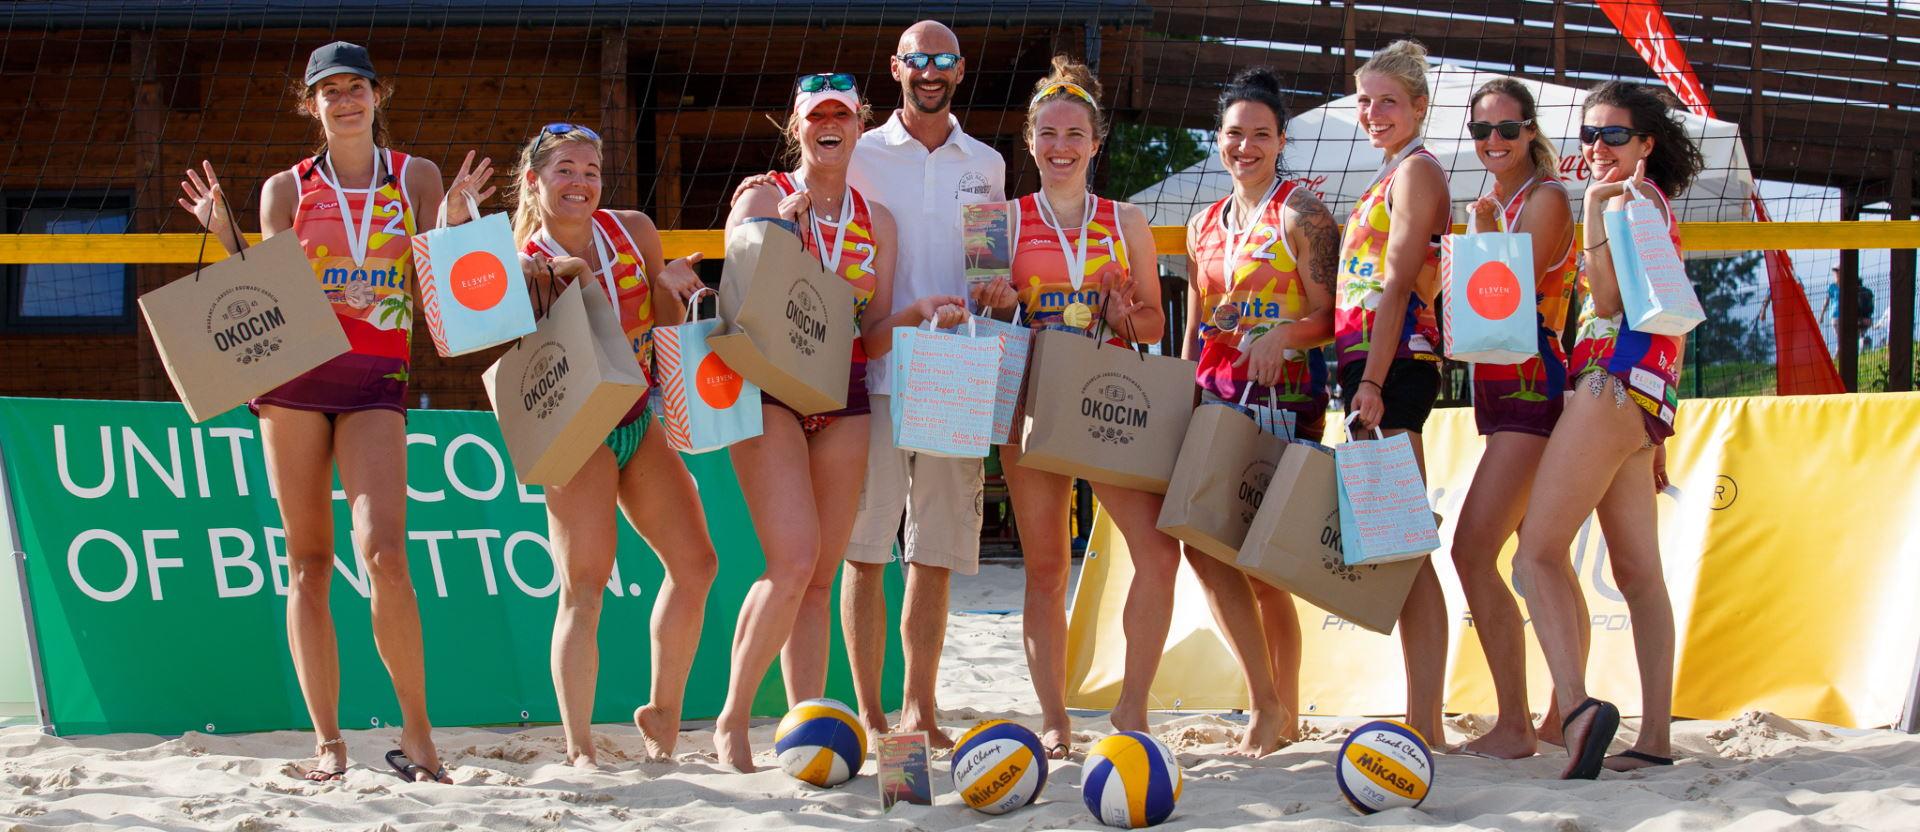 Turniej_damski_warsaw_beach_benetton_cup_05072020